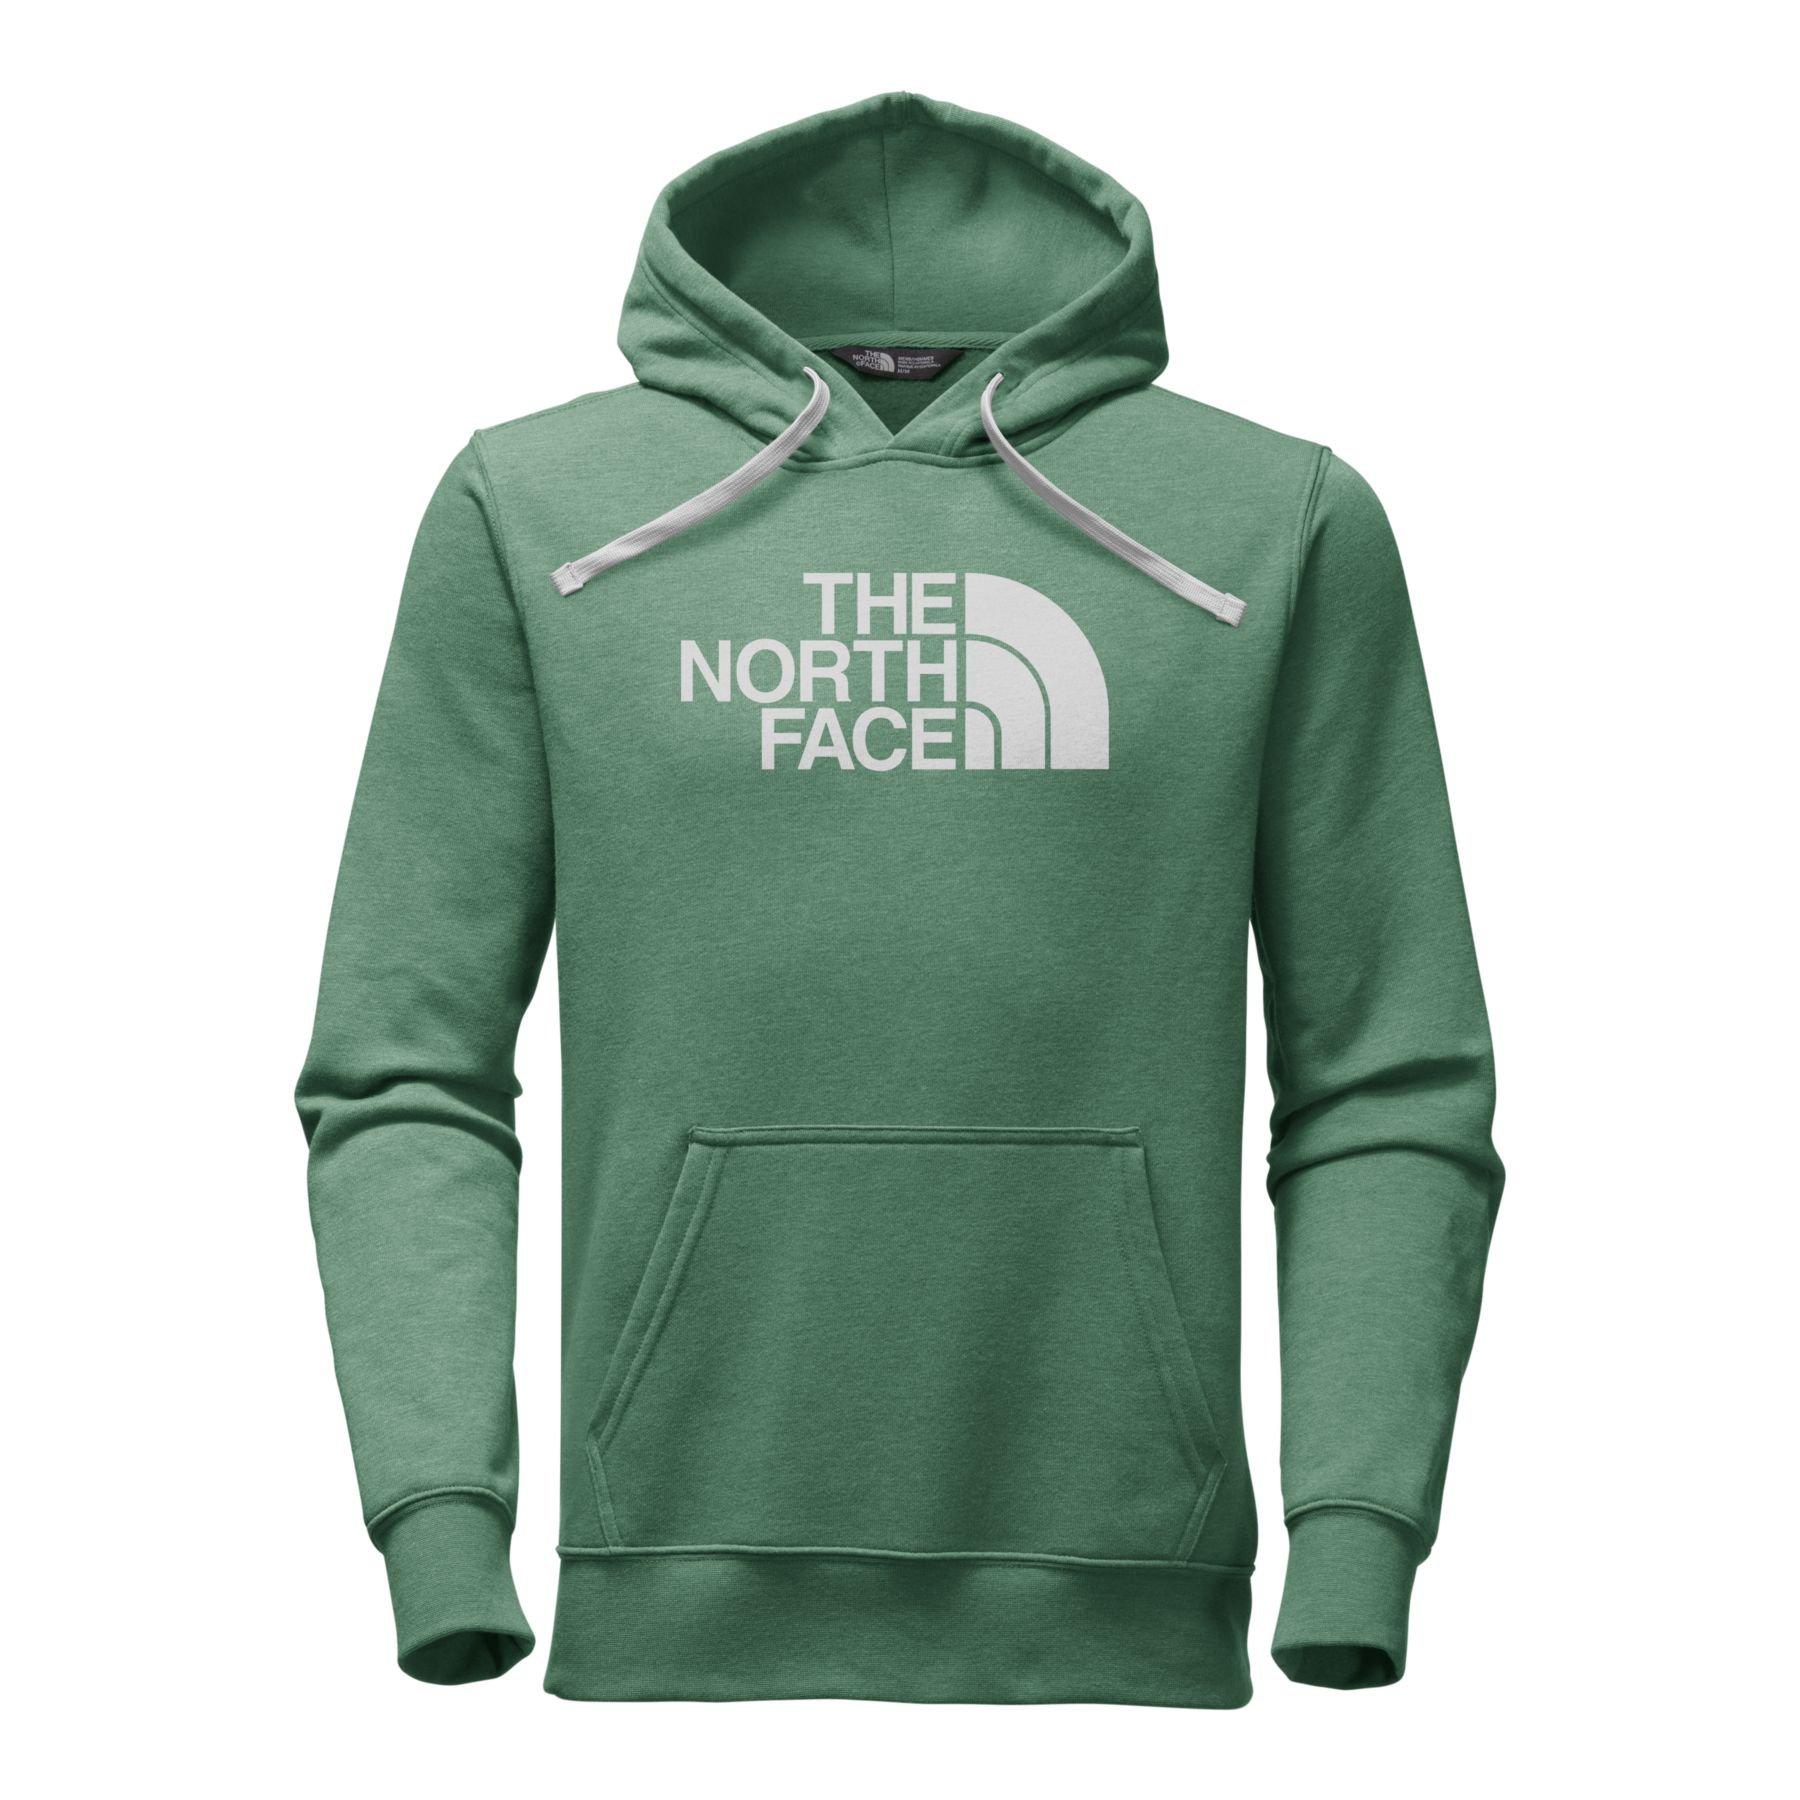 The North Face Men's Half Dome Hoodie - Smoke Pine Heather/Glacier Gray - L